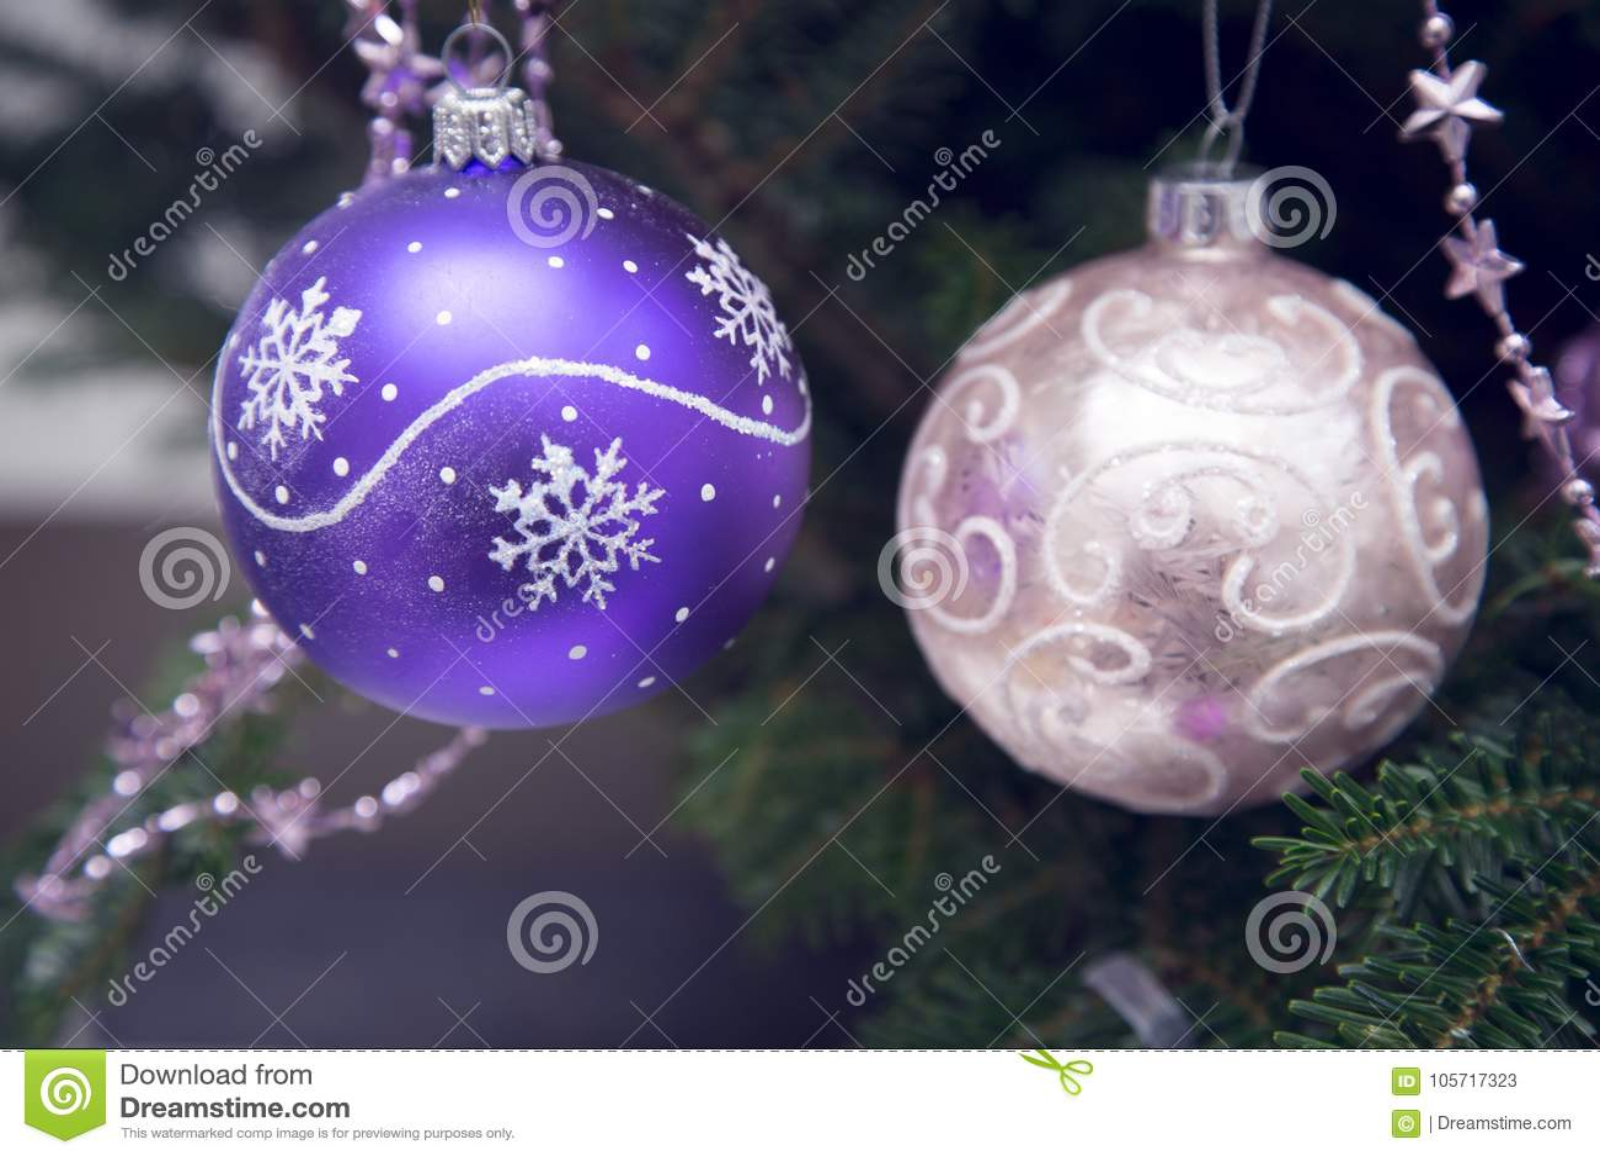 Pink And Purple Christmas Tree Balls Stock Image Image Of December Festive 105717323